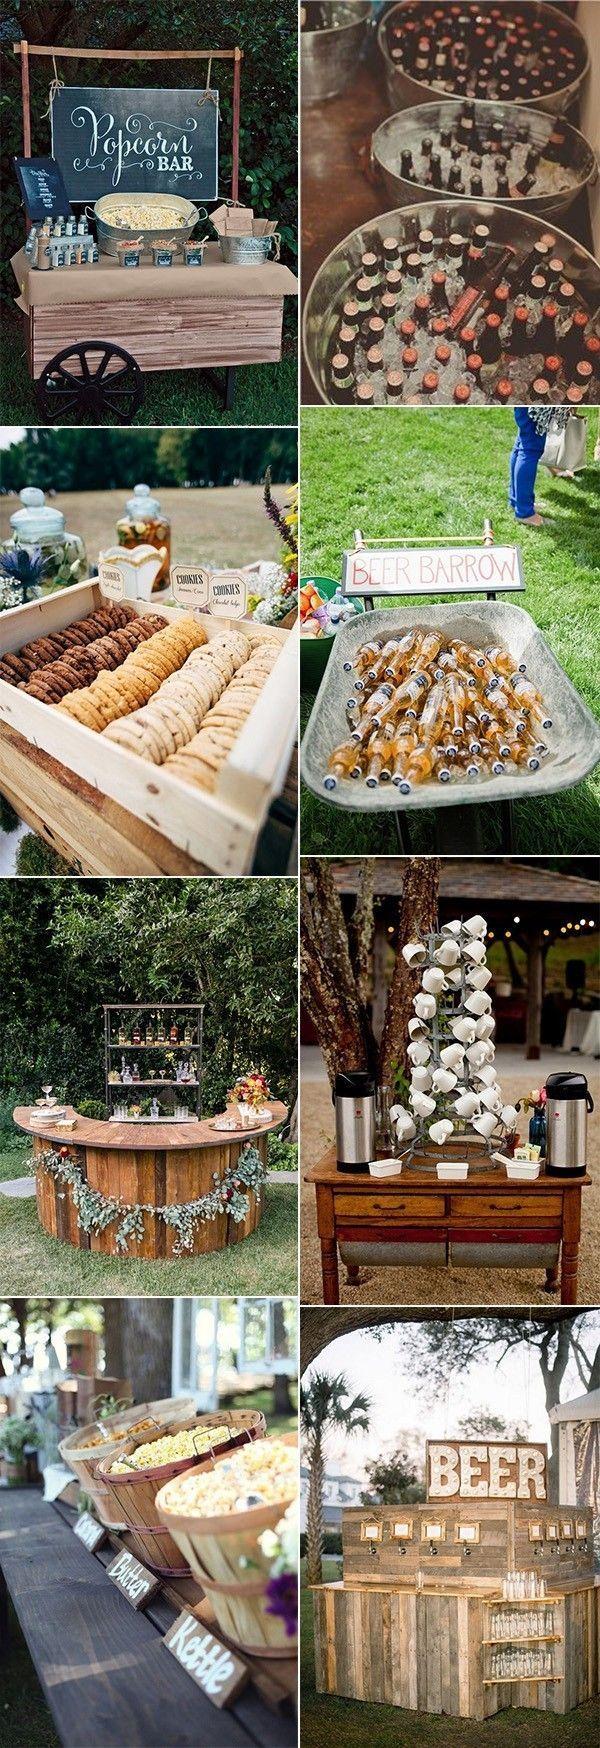 outdoor wedding food and drink ideas for reception #weddingideas #weddingdecor #outdoorwedding #backyardwedding #gardenwedding